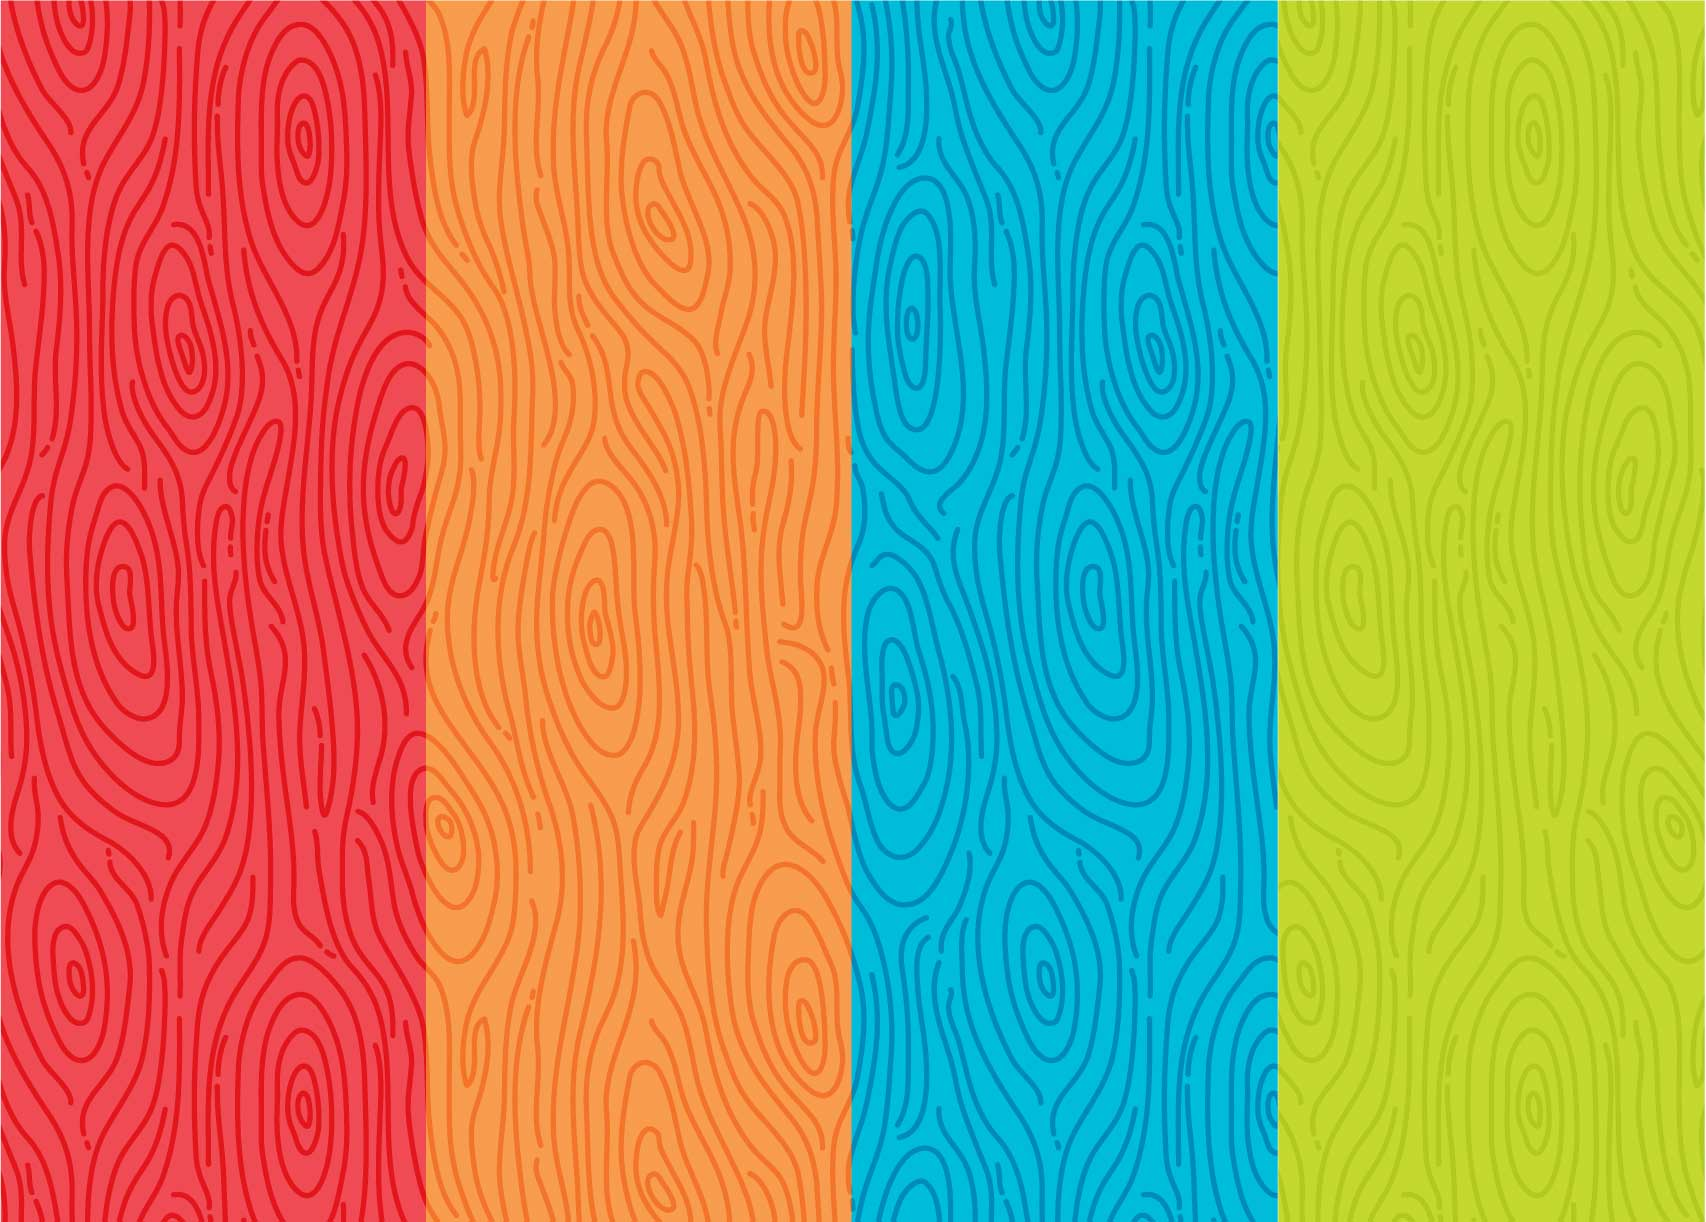 Grapple_Wood_Patterns.jpg